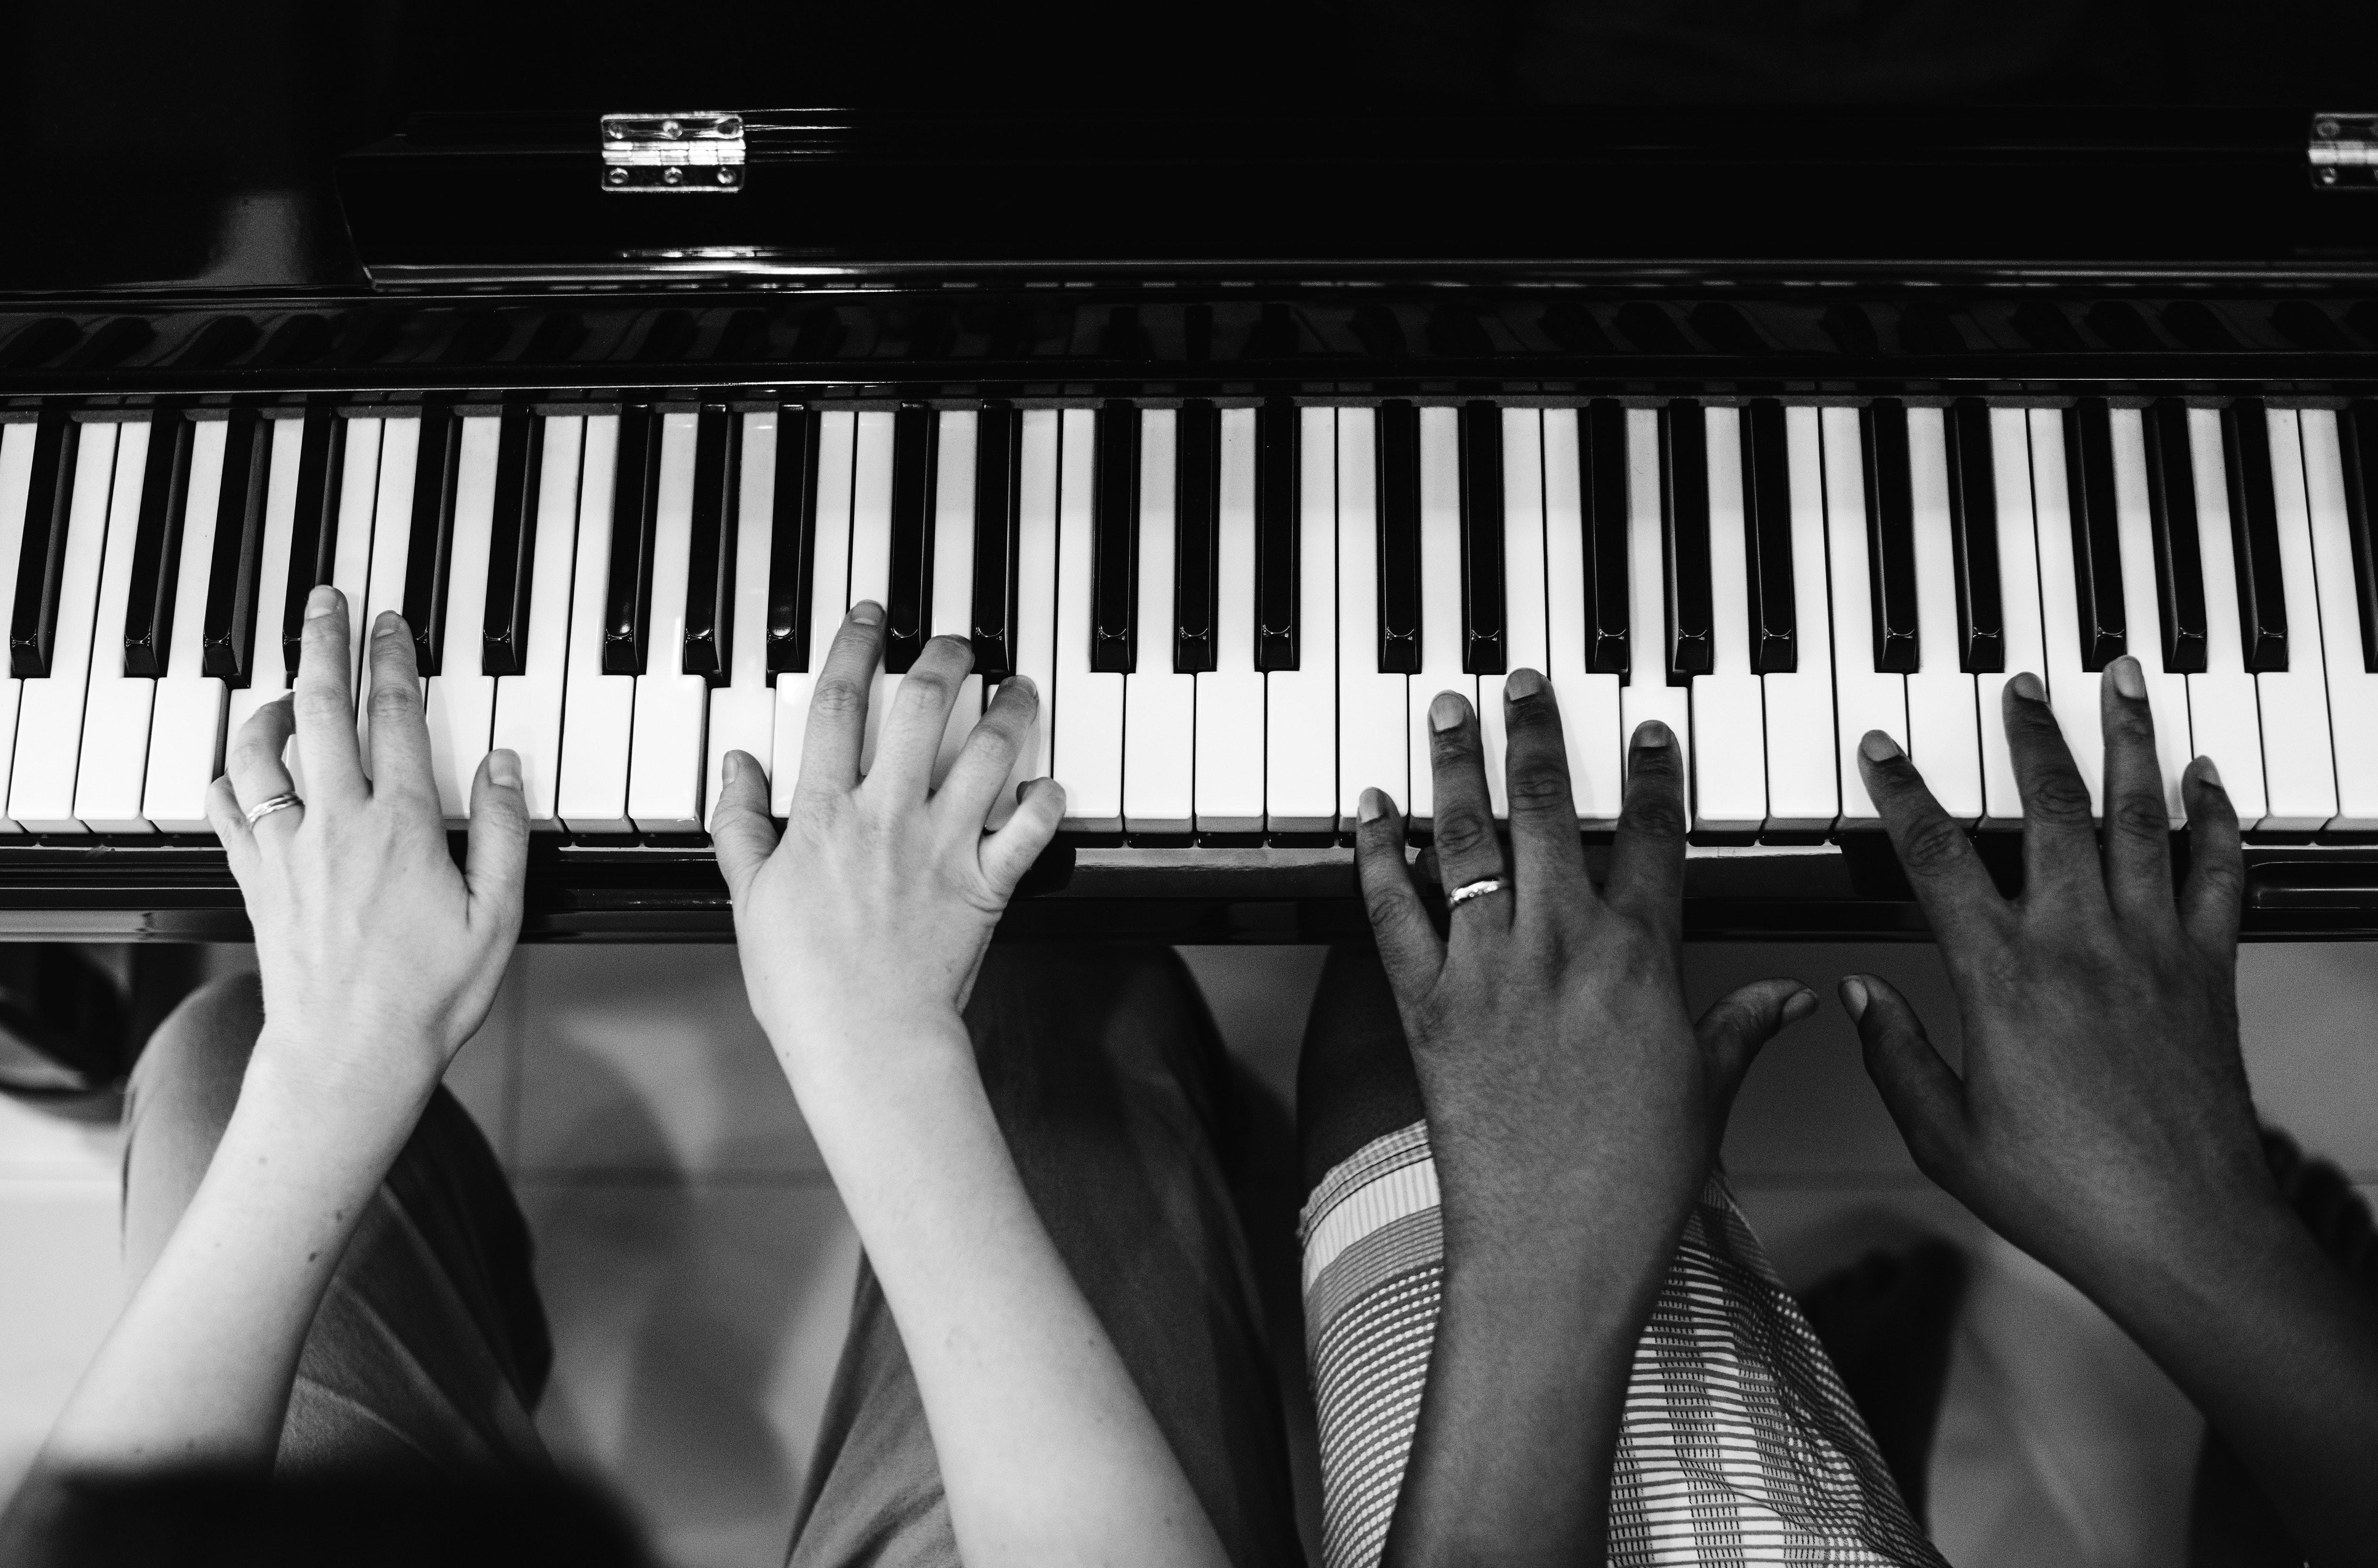 Piano teacher playing duet